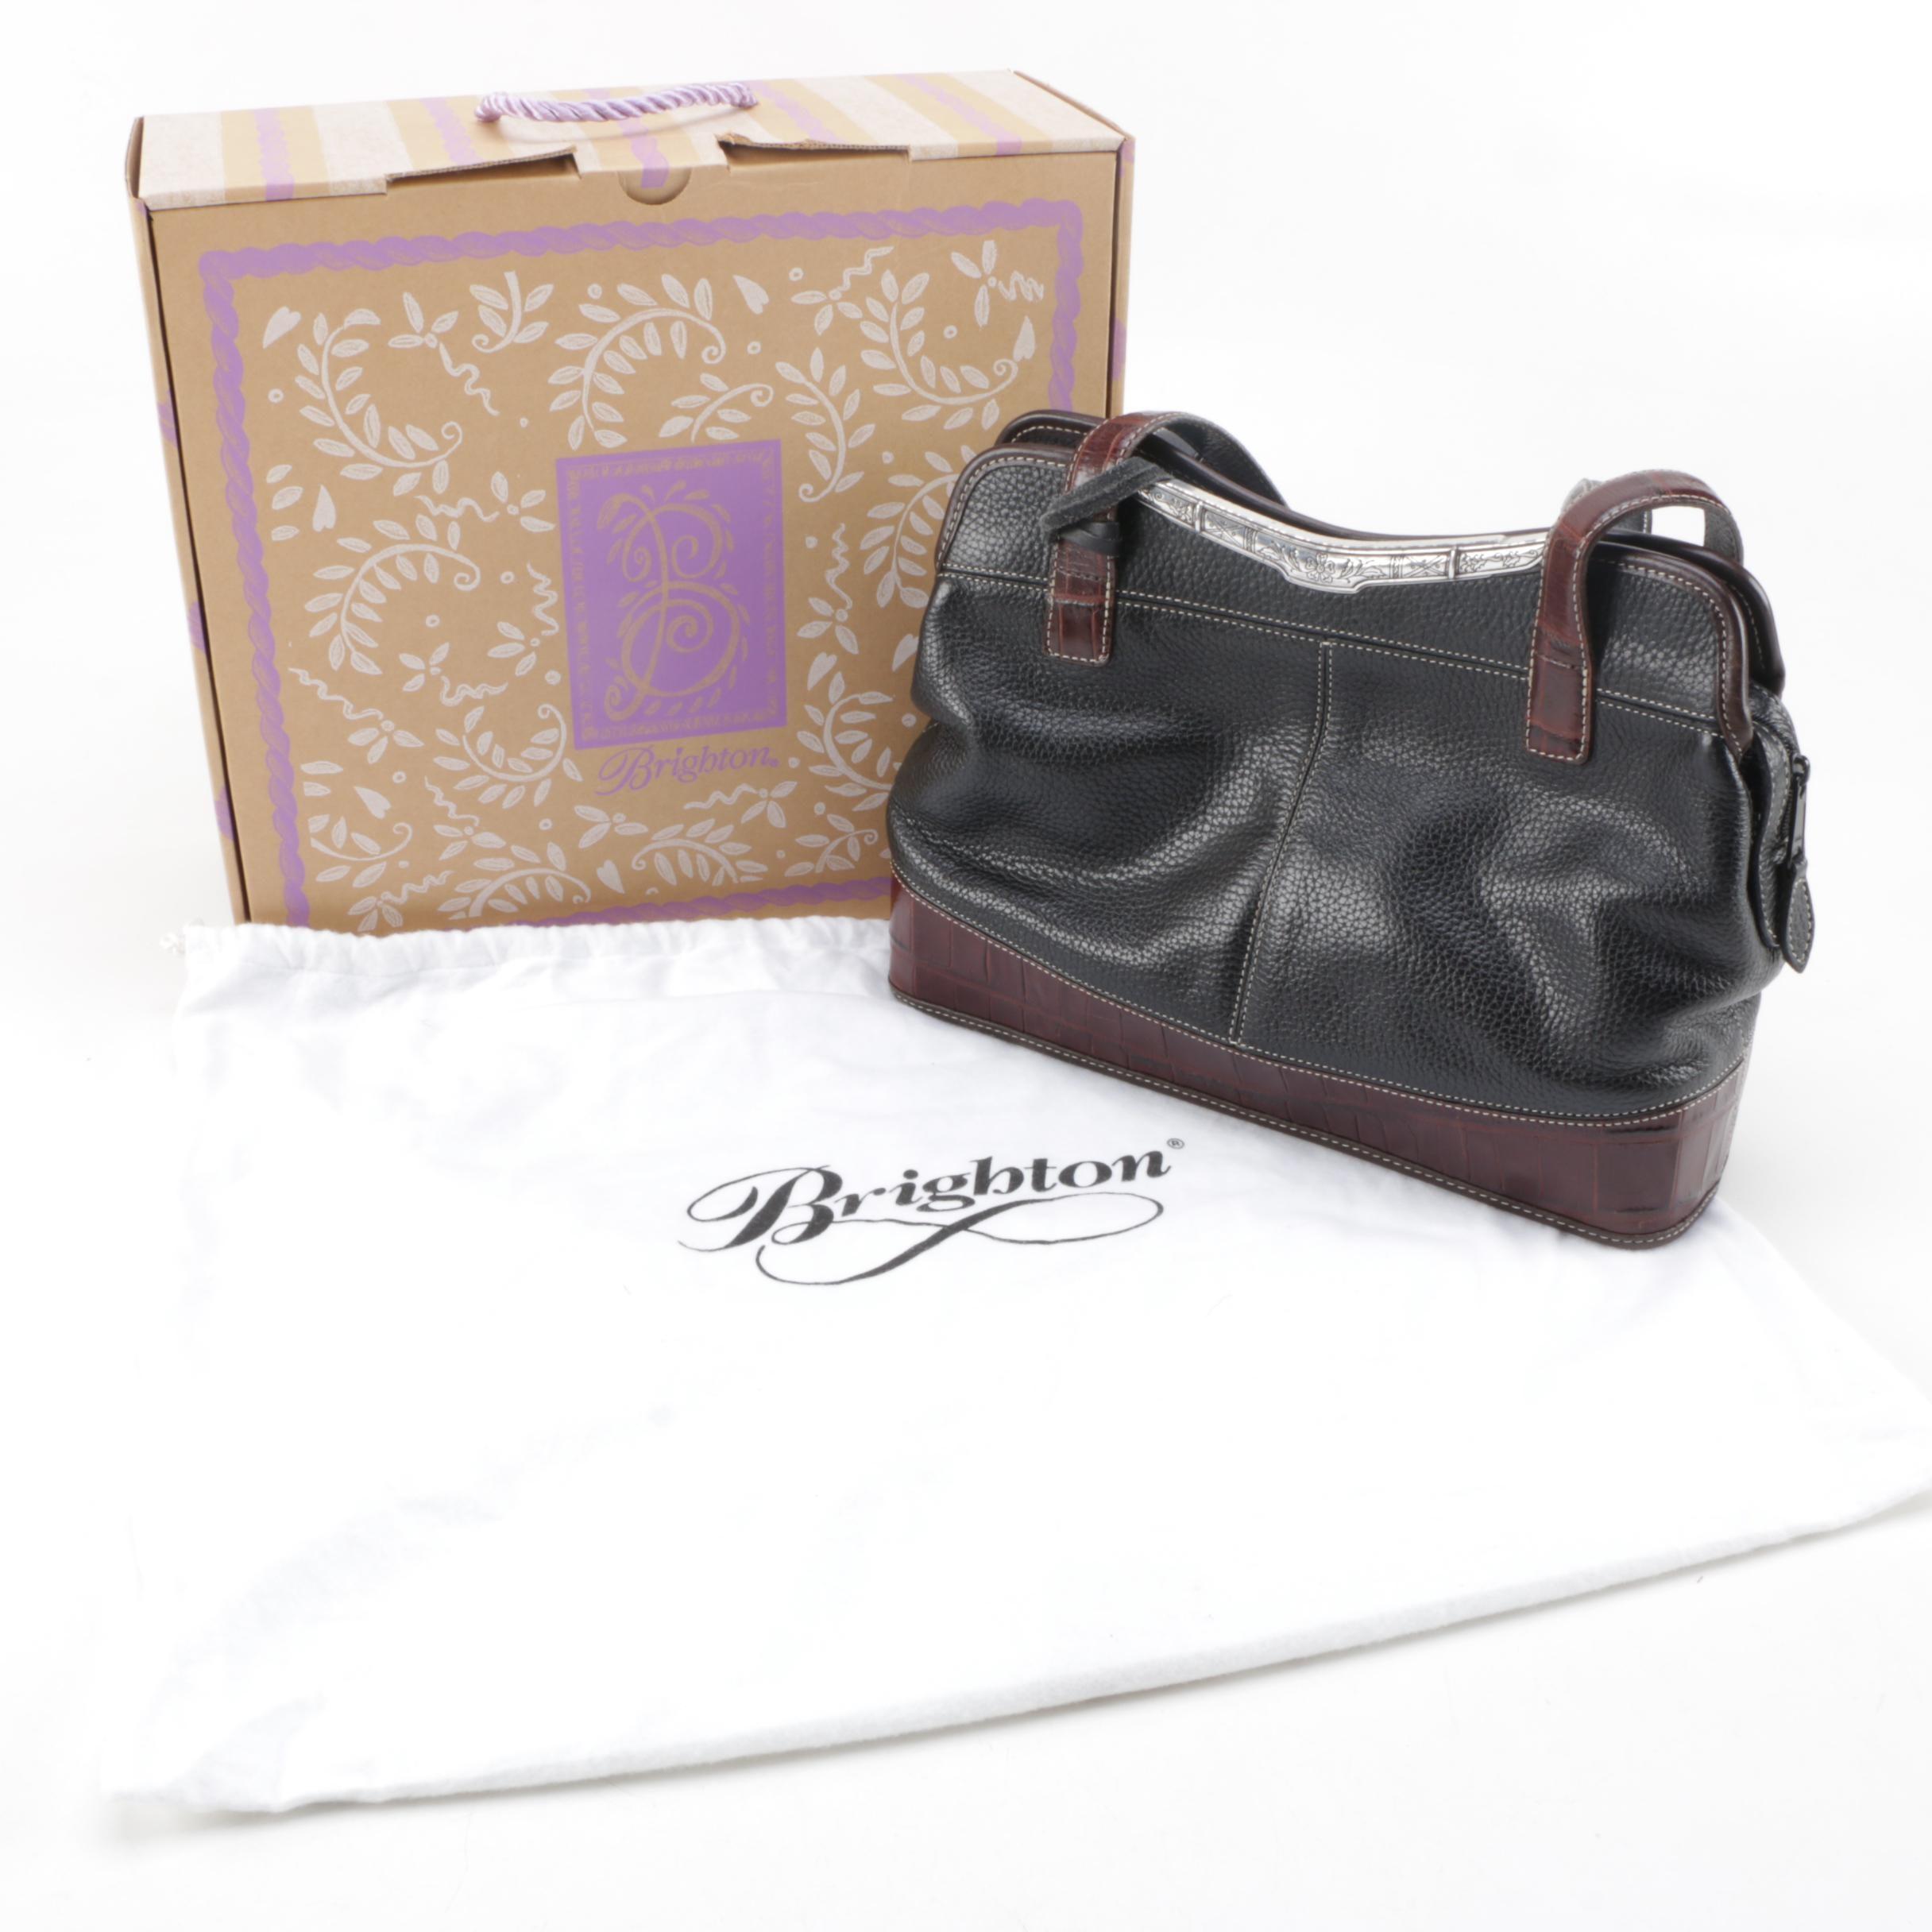 Brighton Black and Brown Leather Handbag